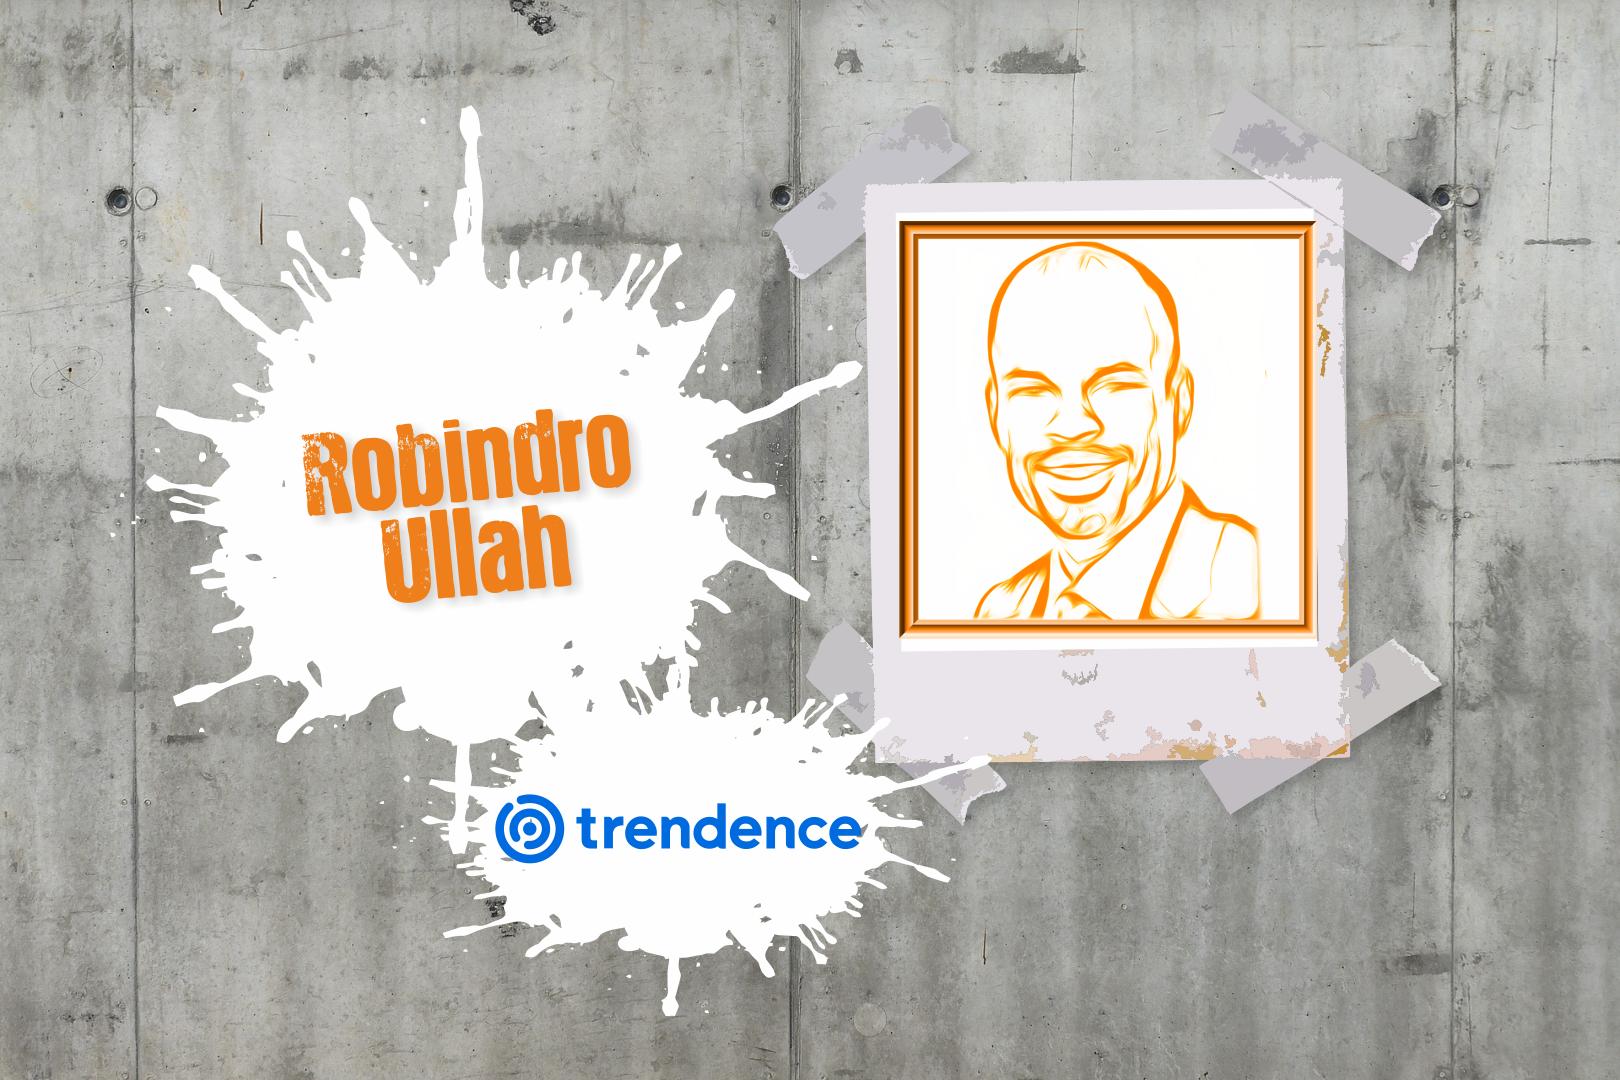 Robindro Ullah